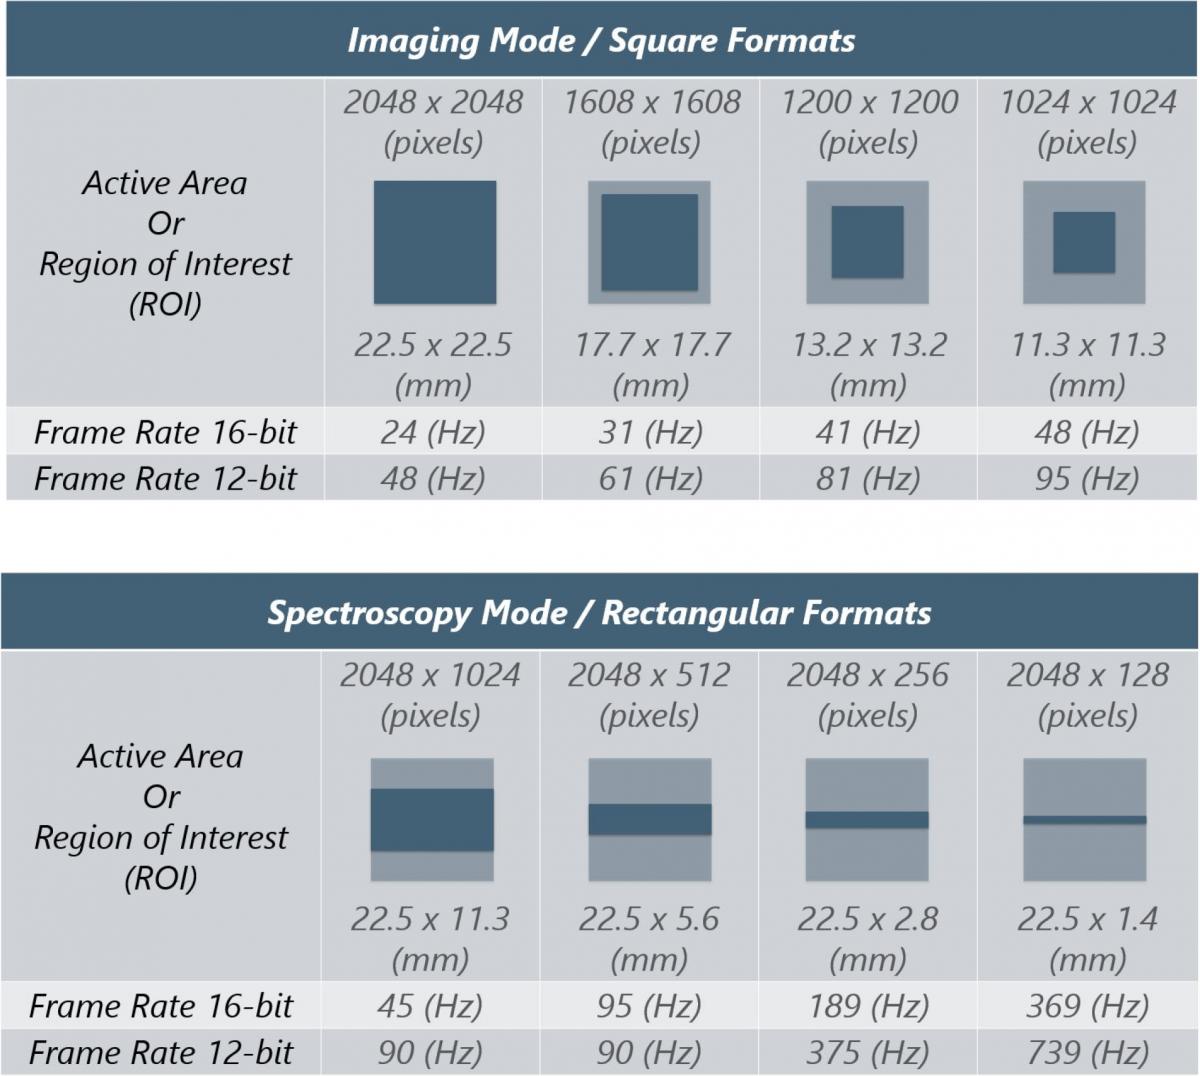 x ray scmos camera imaging modes